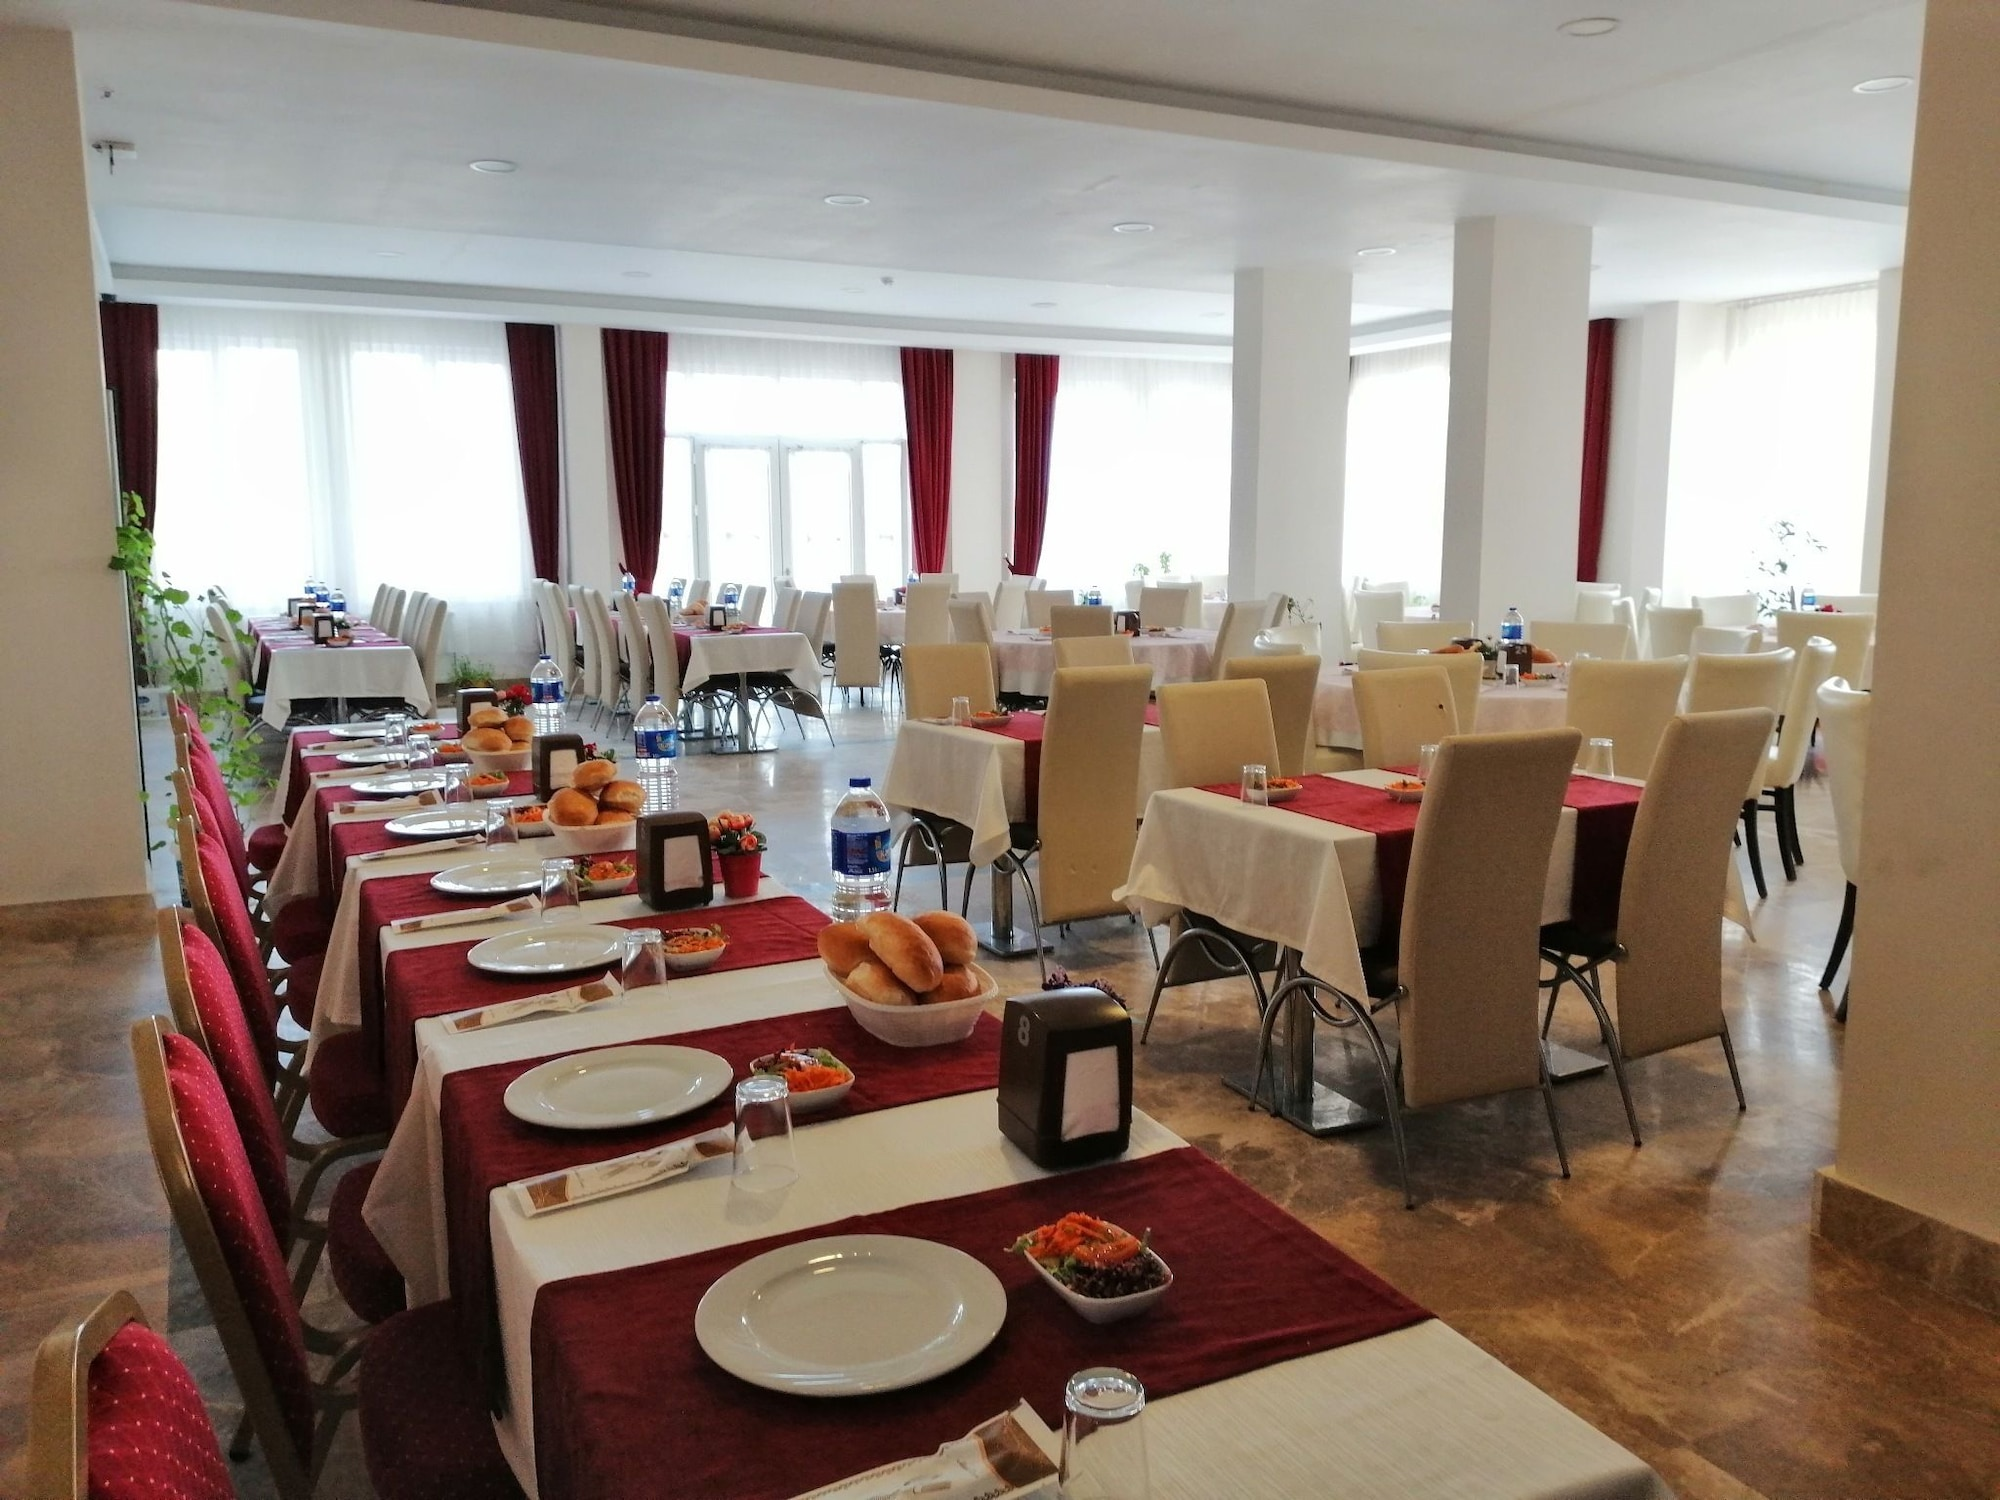 Paflagonya Otel & Restoran, Şabanözü